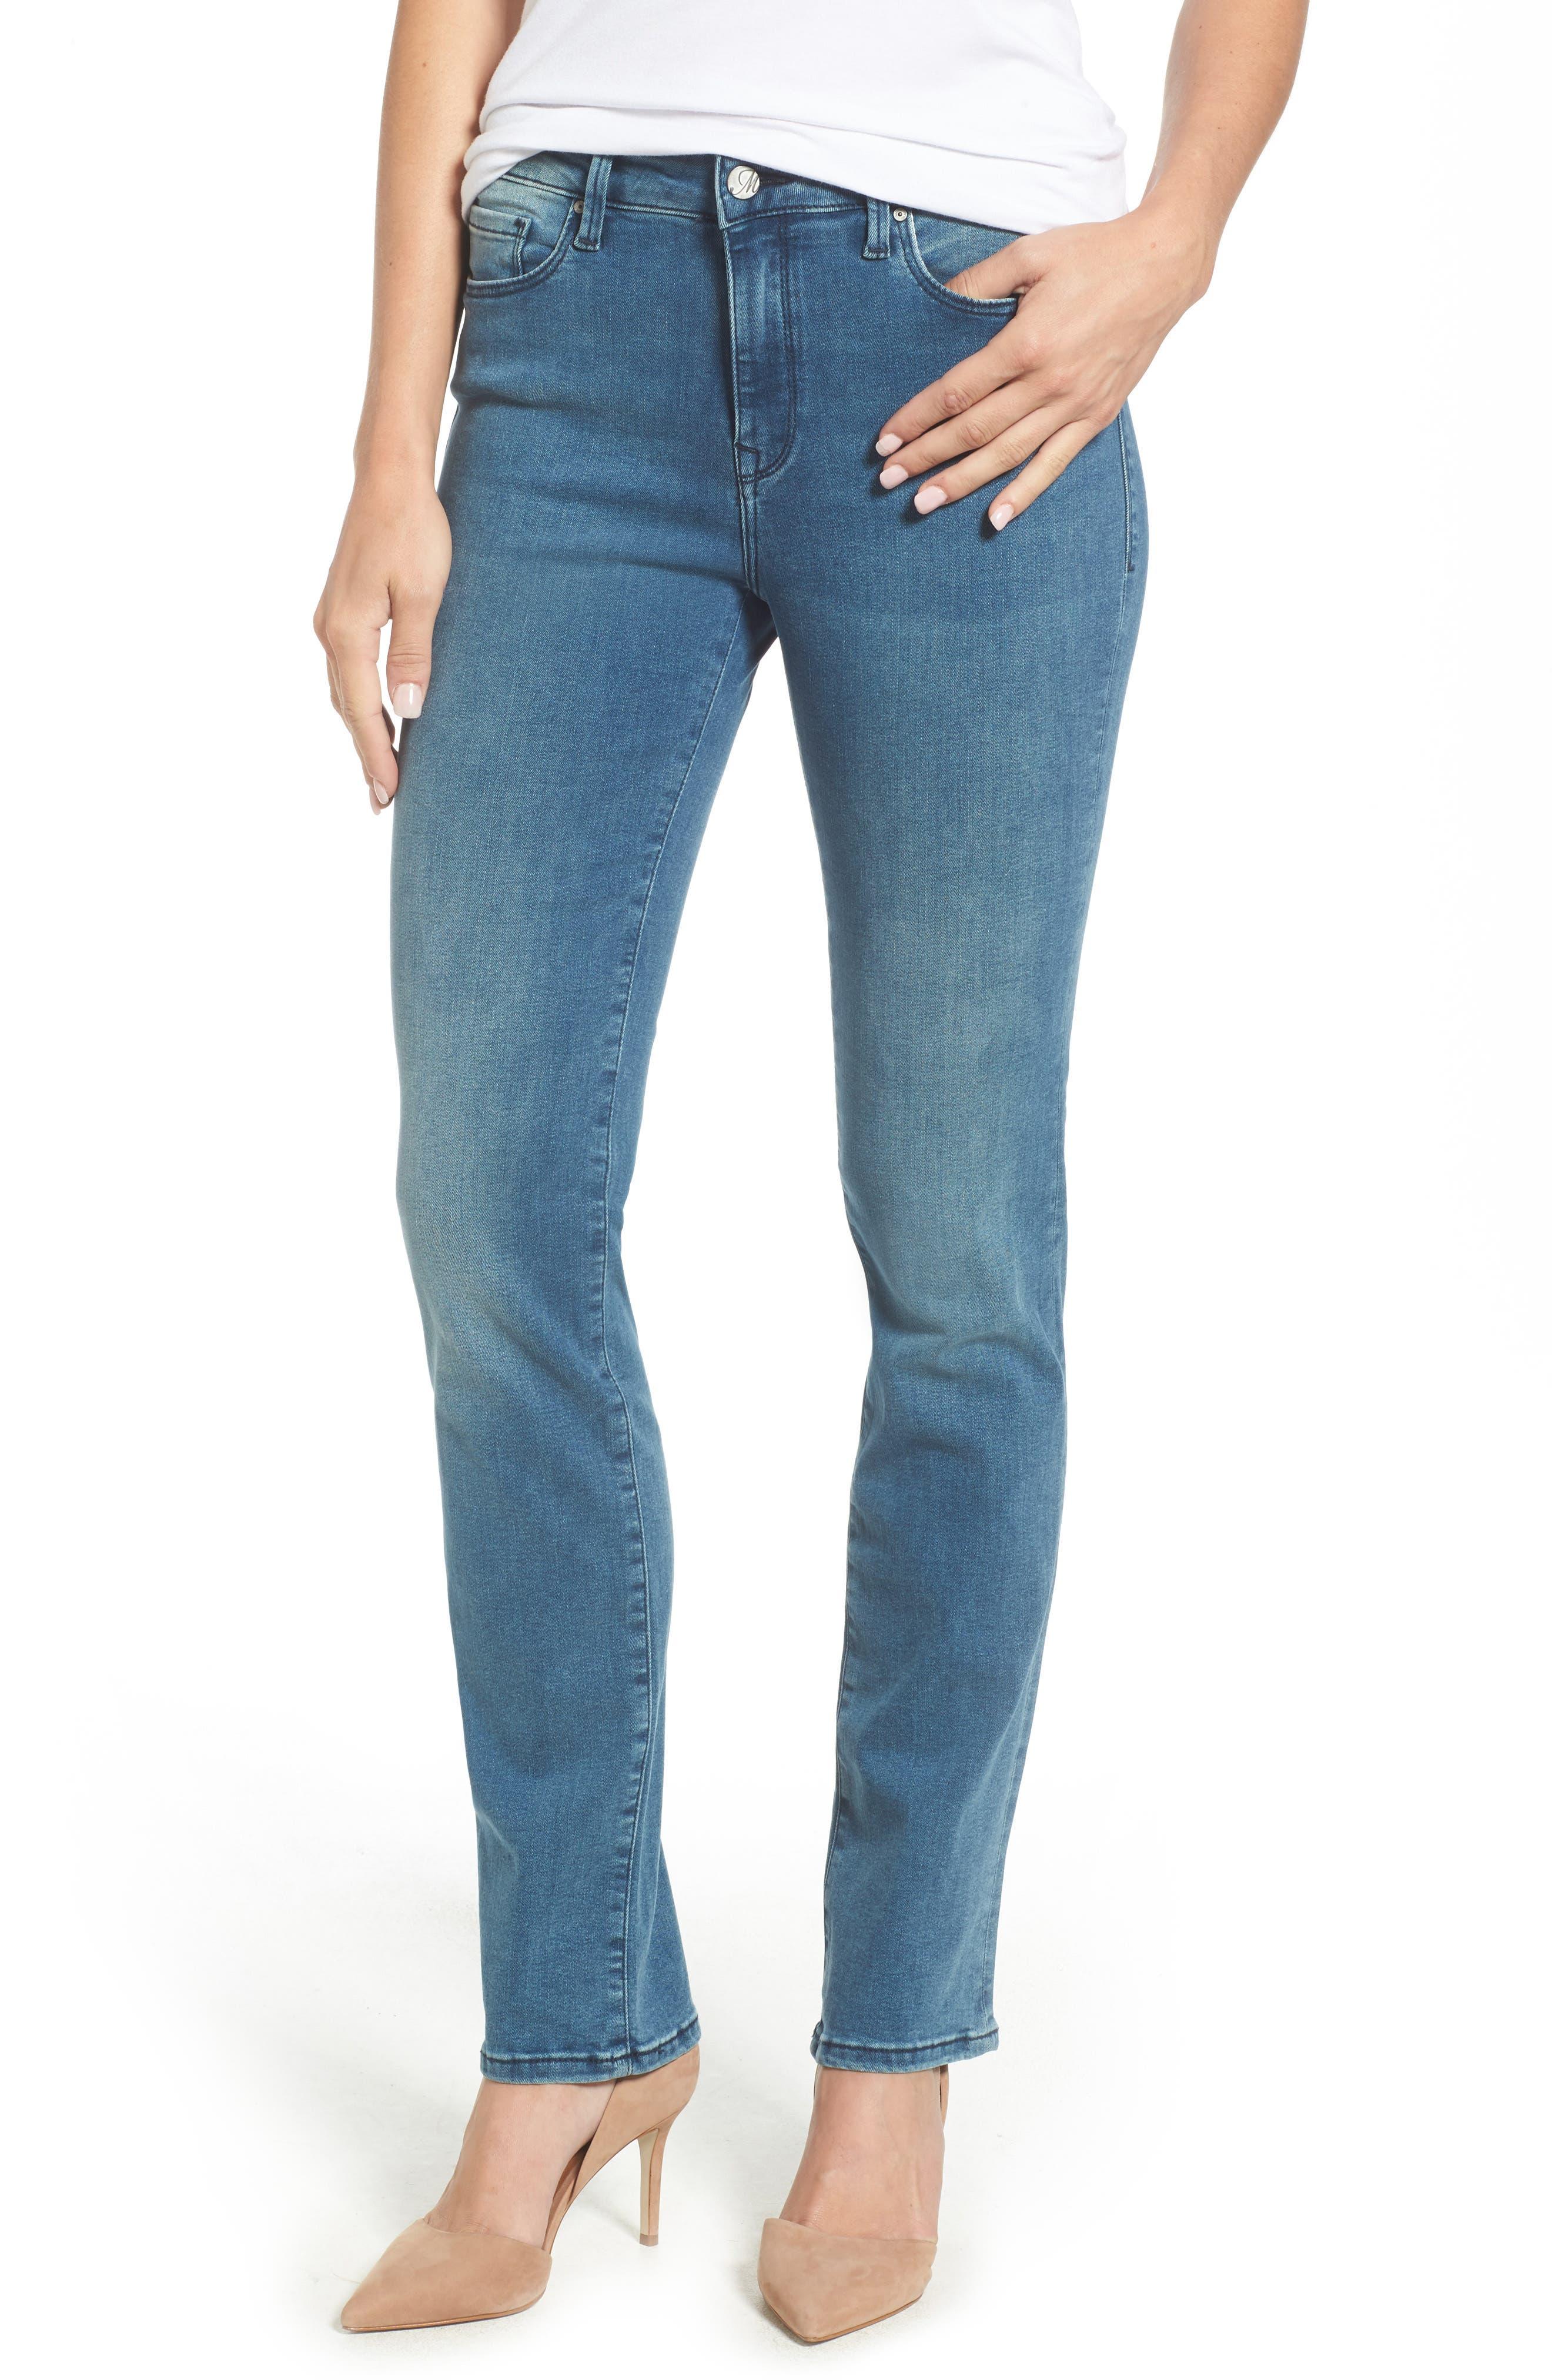 Kendra High Waist Straight Leg Jeans,                         Main,                         color, 420